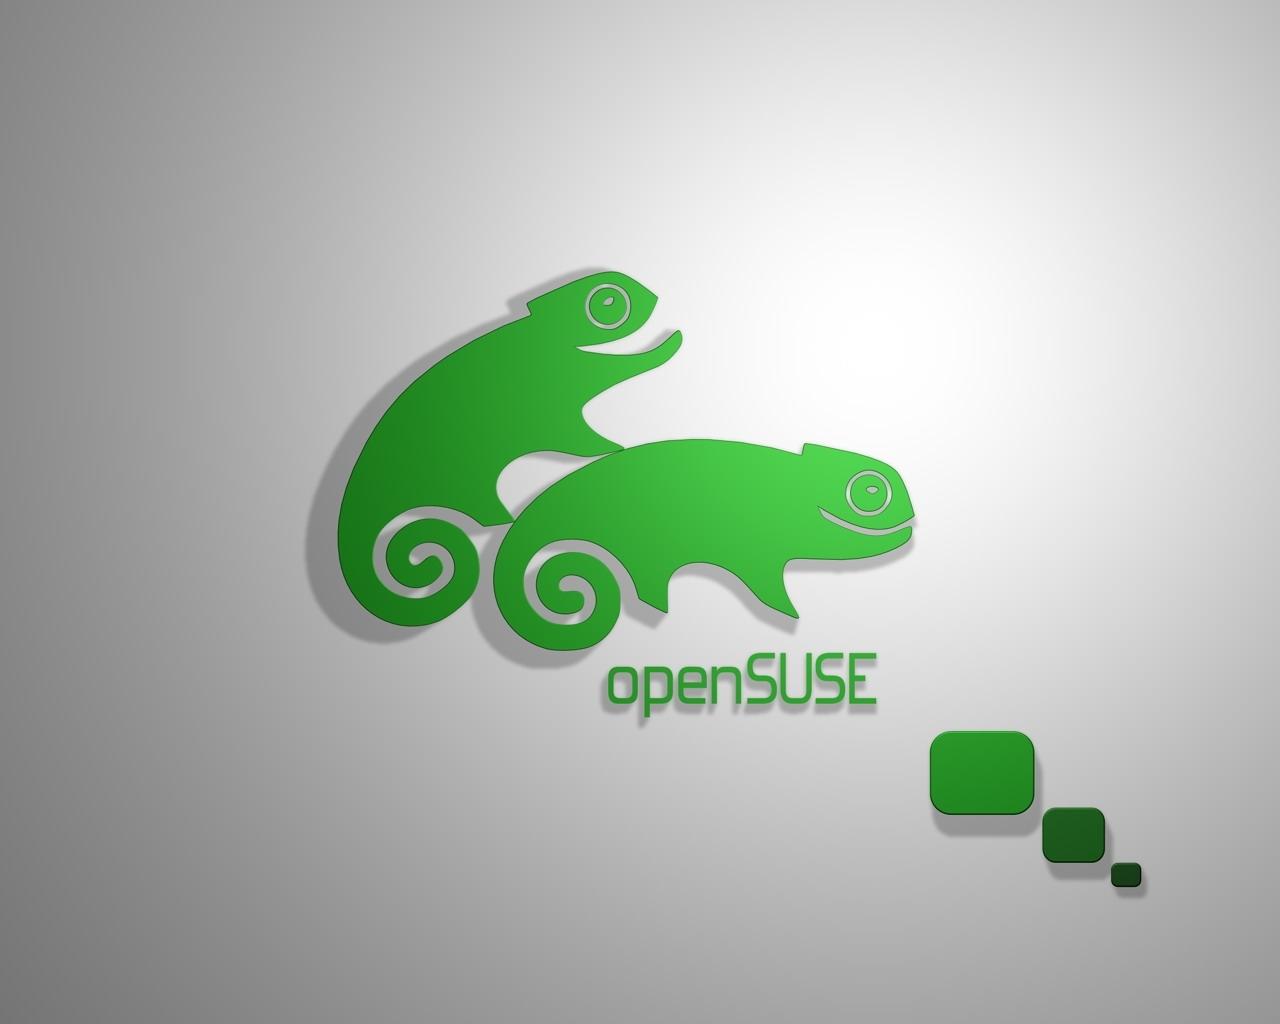 6778 descargar fondo de pantalla Logos, Imágenes: protectores de pantalla e imágenes gratis